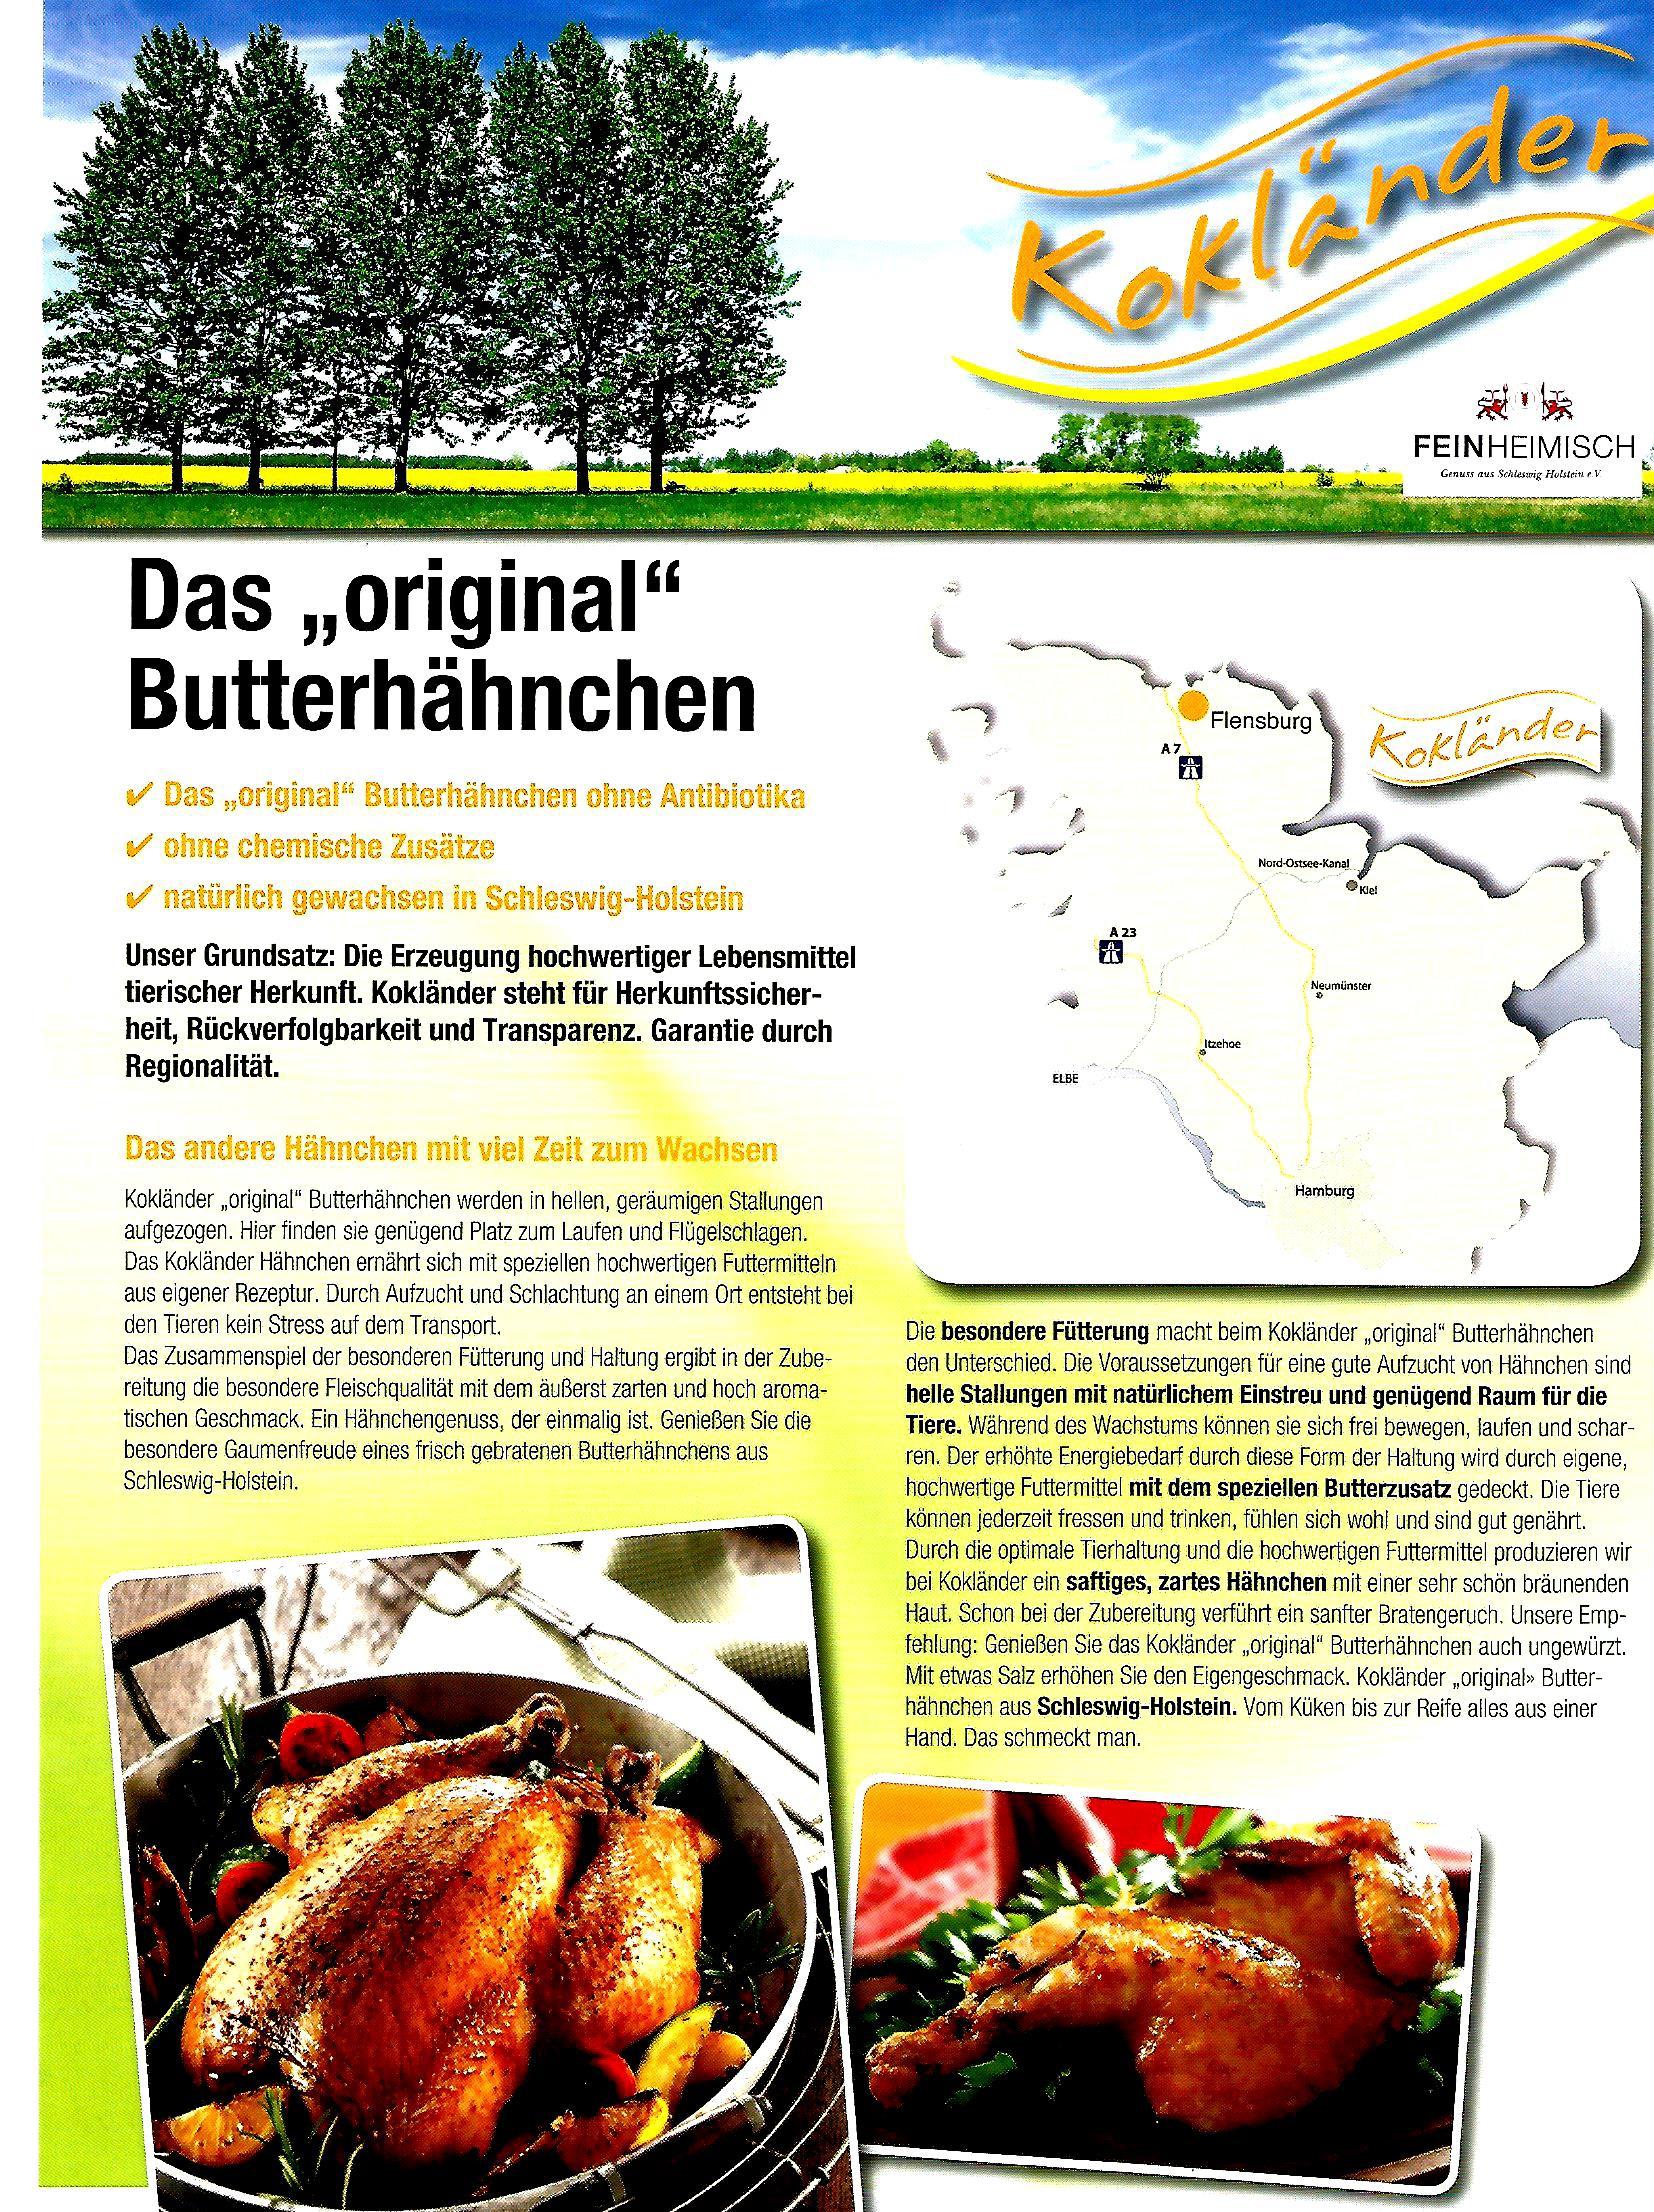 Beste Burger in Lübeck - Koklaender